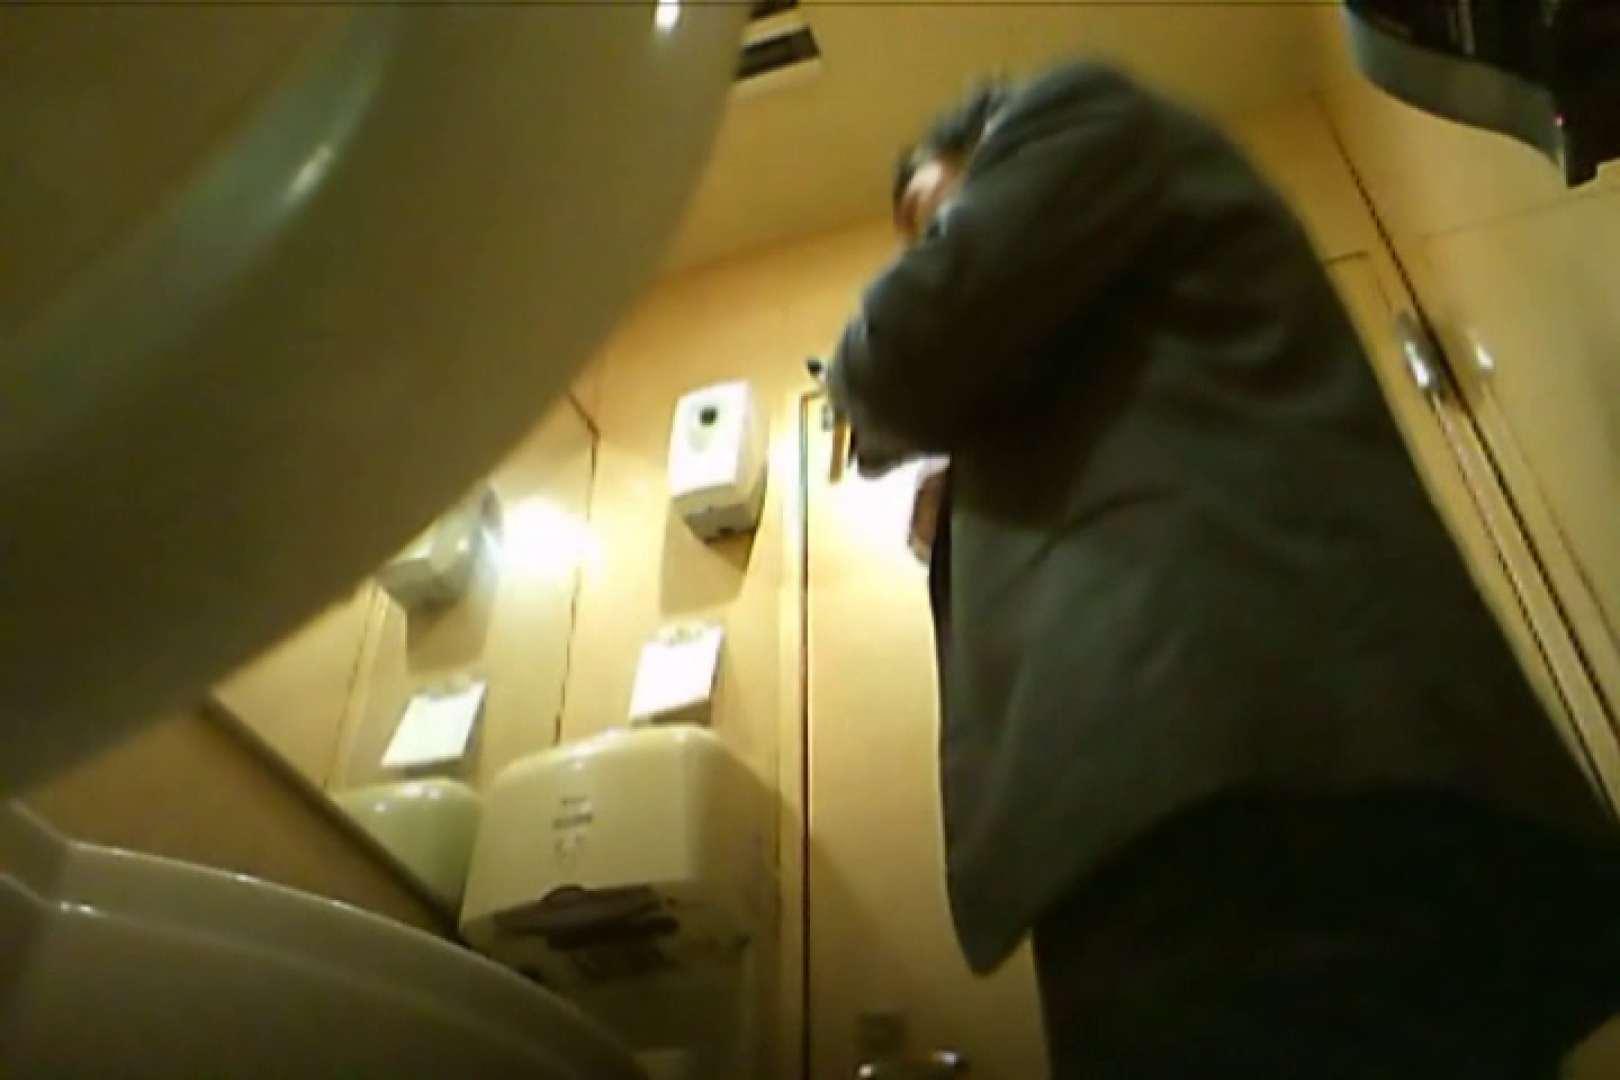 SEASON 2ND!掴み取りさんの洗面所覗き!in新幹線!VOL.06 男子のお尻   のぞき特集  87枚 31